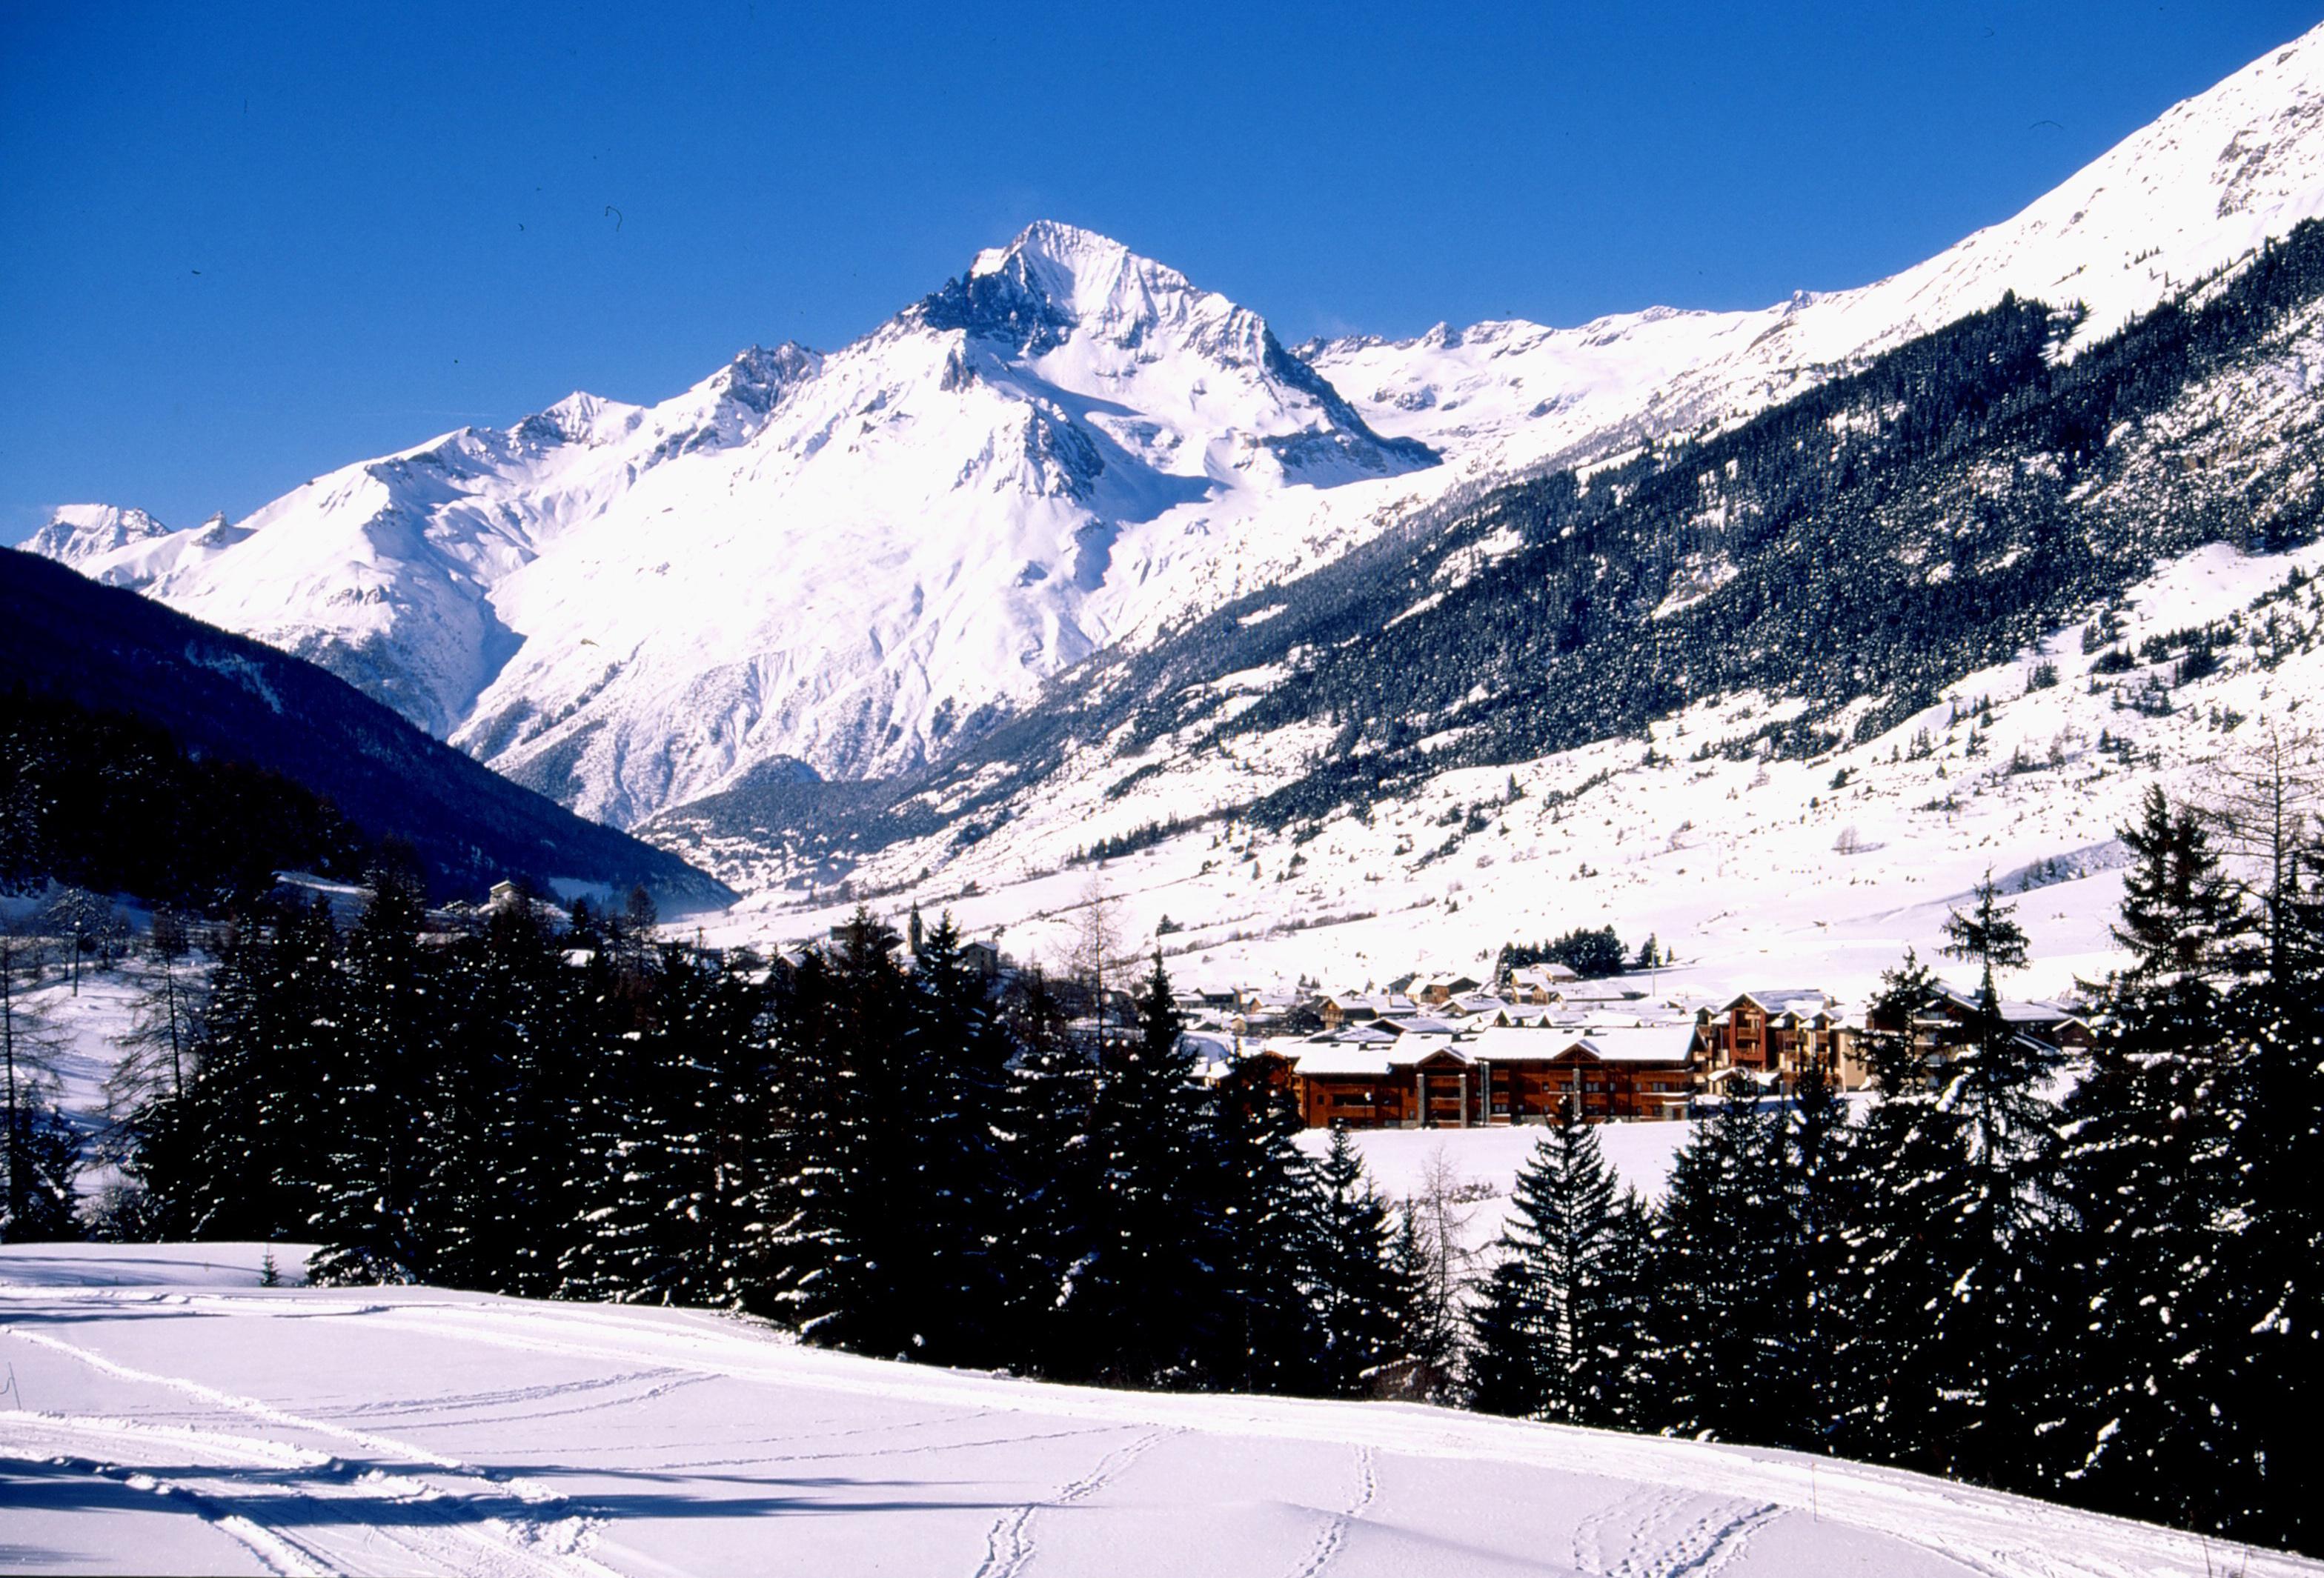 Lanslevillard ski